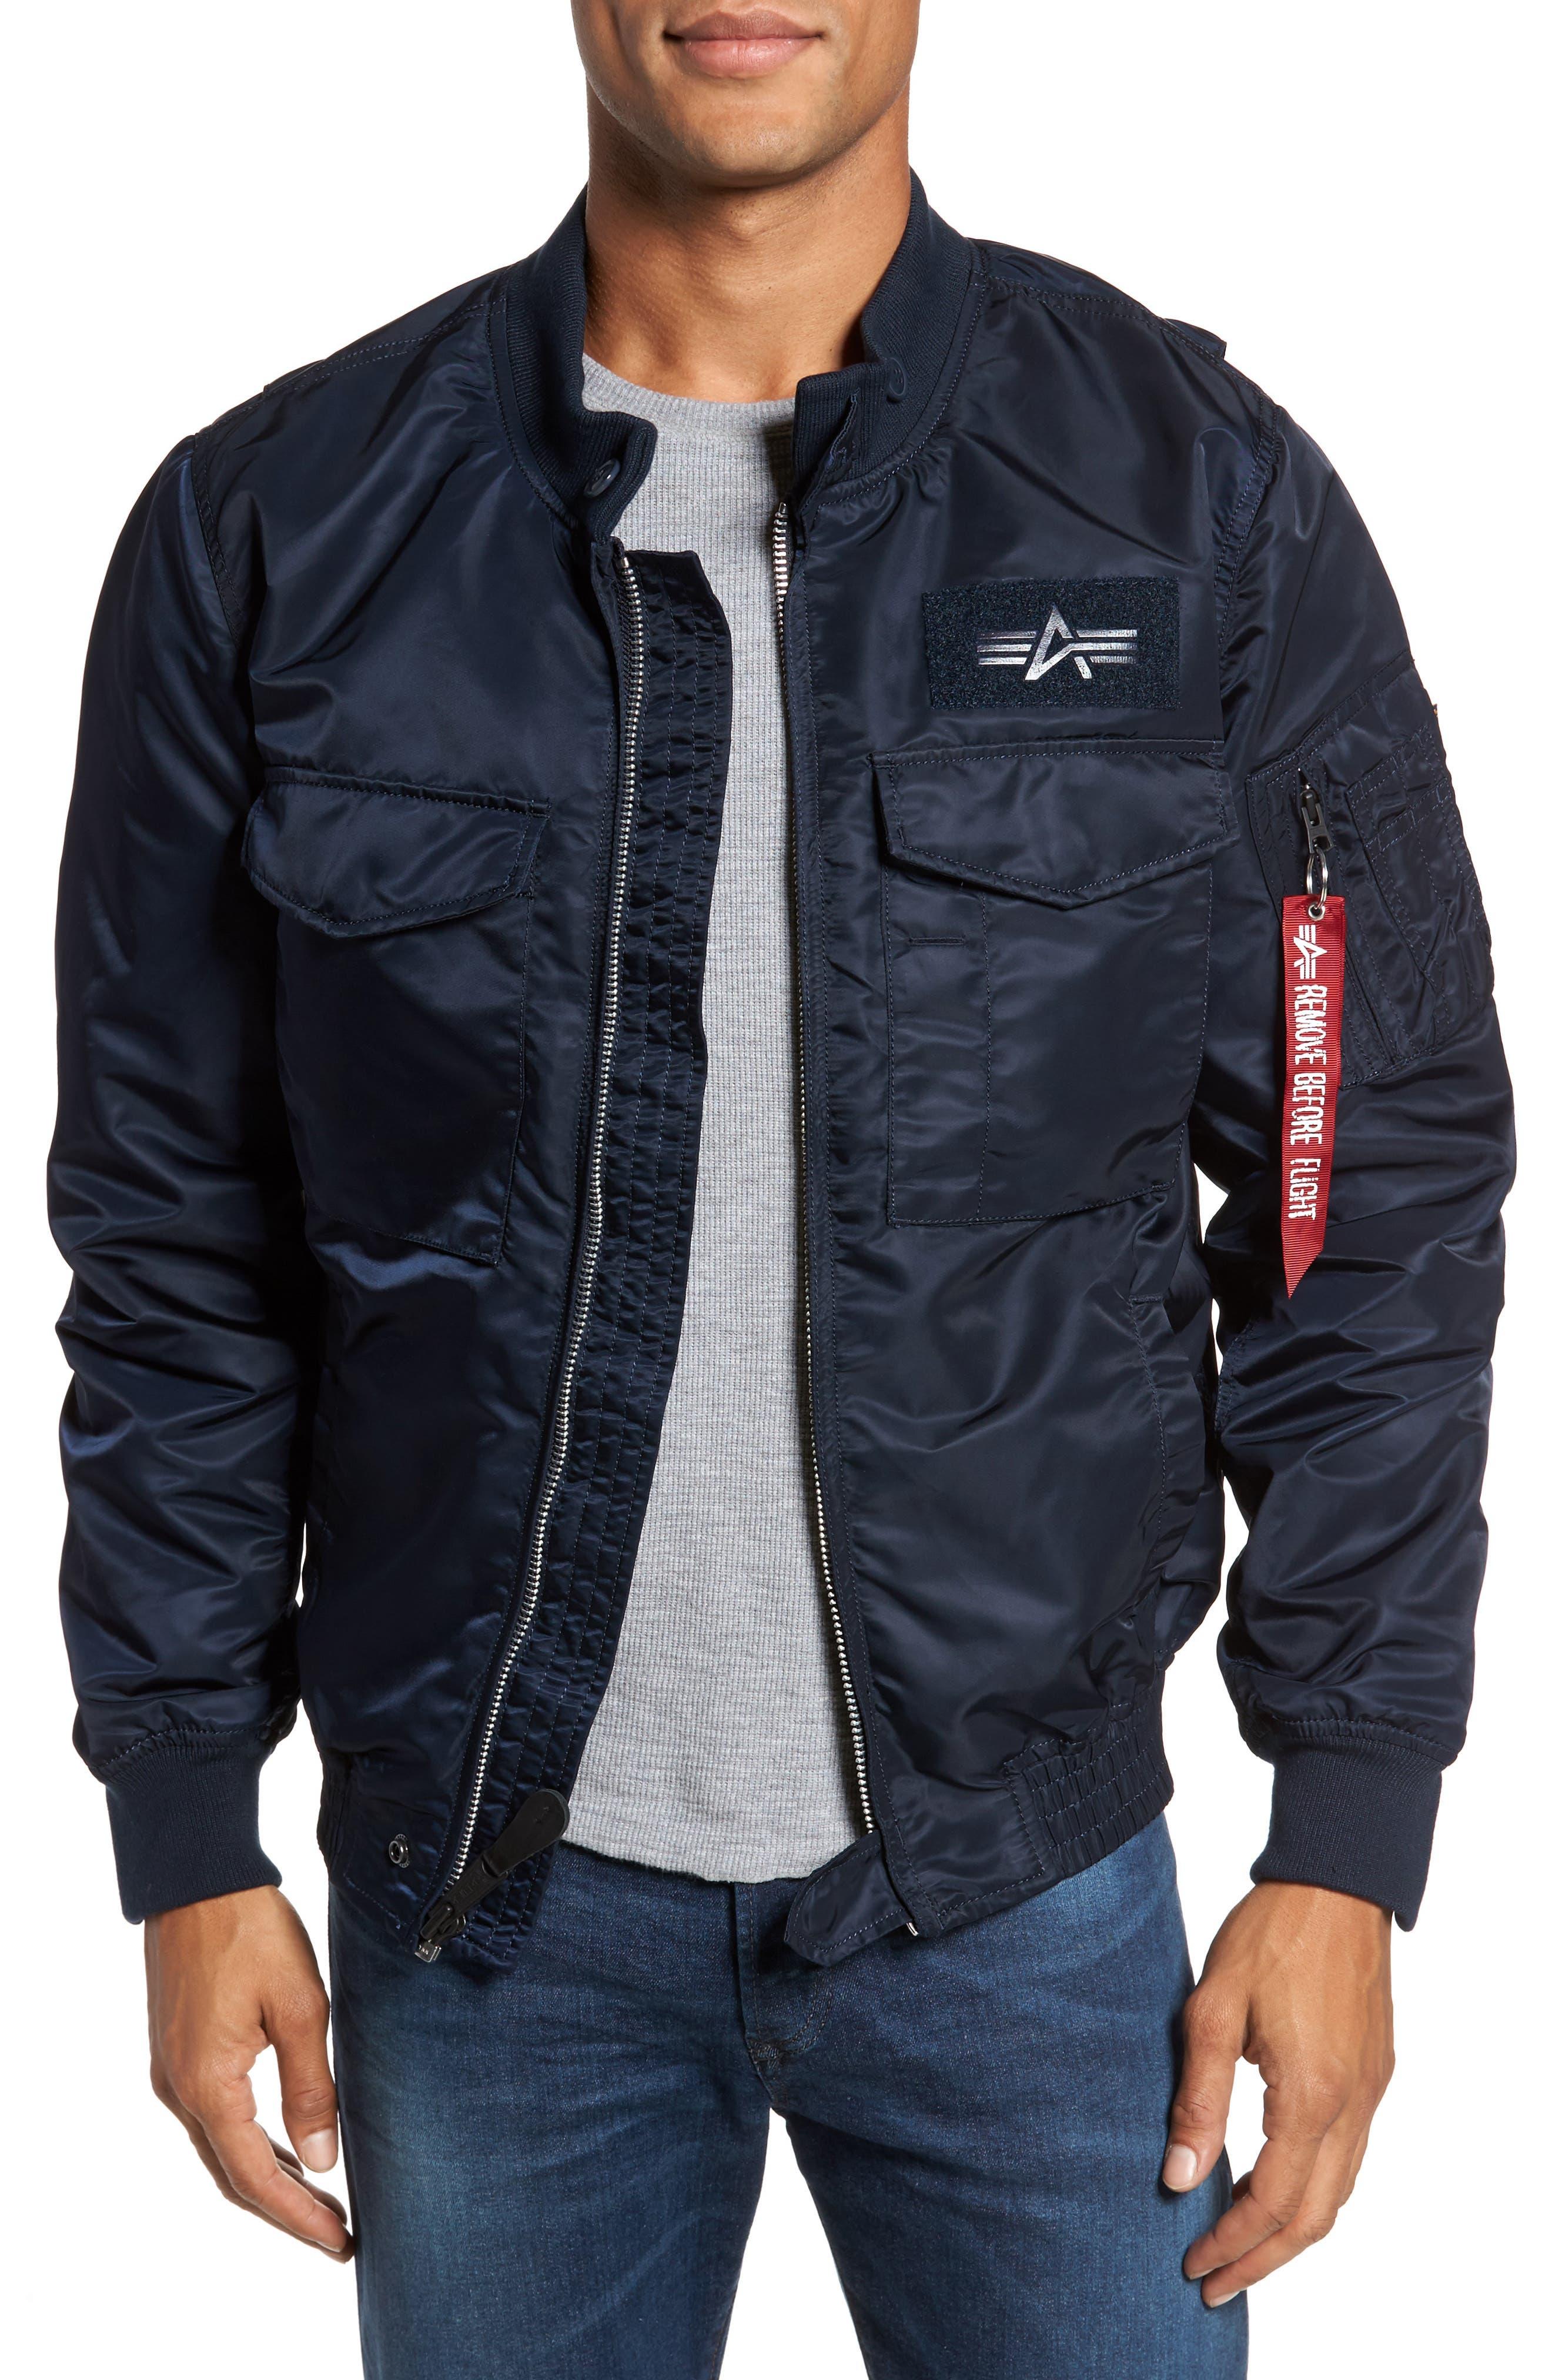 Weps Mod Jacket,                         Main,                         color, Replica Blue